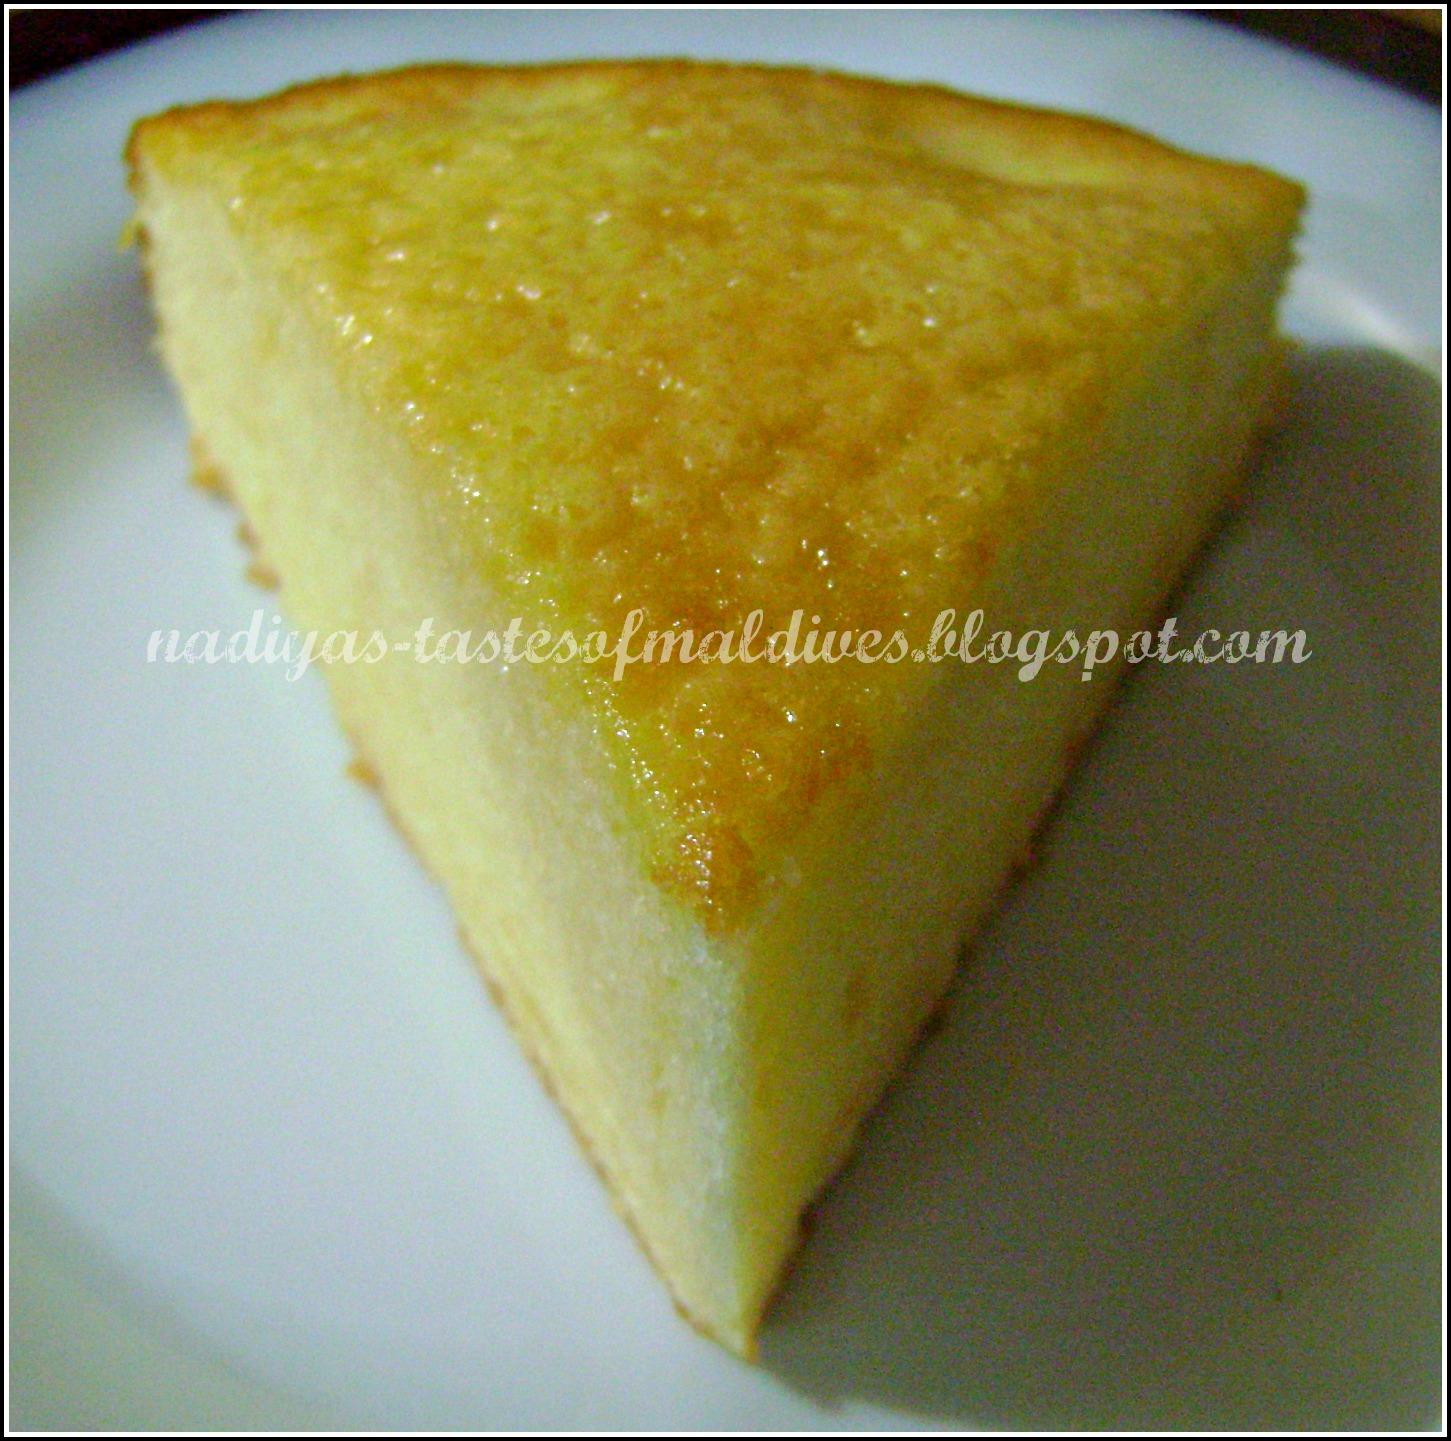 Nadiyas tastes of maldives another gerikiru boakibaa or sweetened another gerikiru boakibaa or sweetened condensed milk cake forumfinder Choice Image